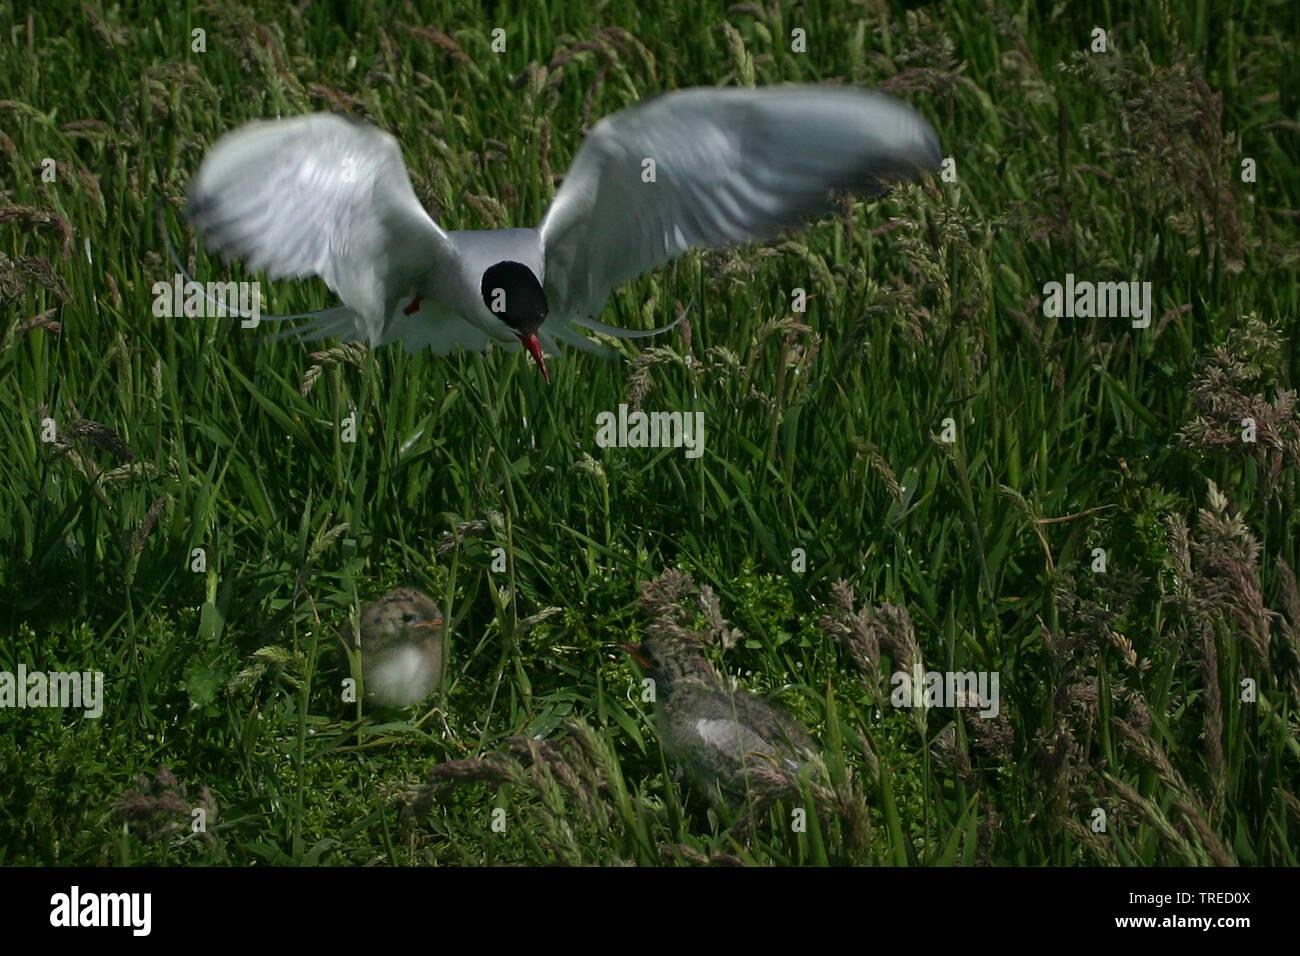 Kuestenseeschwalbe, Kuesten-Seeschwalbe (Sterna paradisaea), fliegend am Nest mit Kueken, Grossbritannien, England, Northumberland, Farne Islands | ar - Stock Image